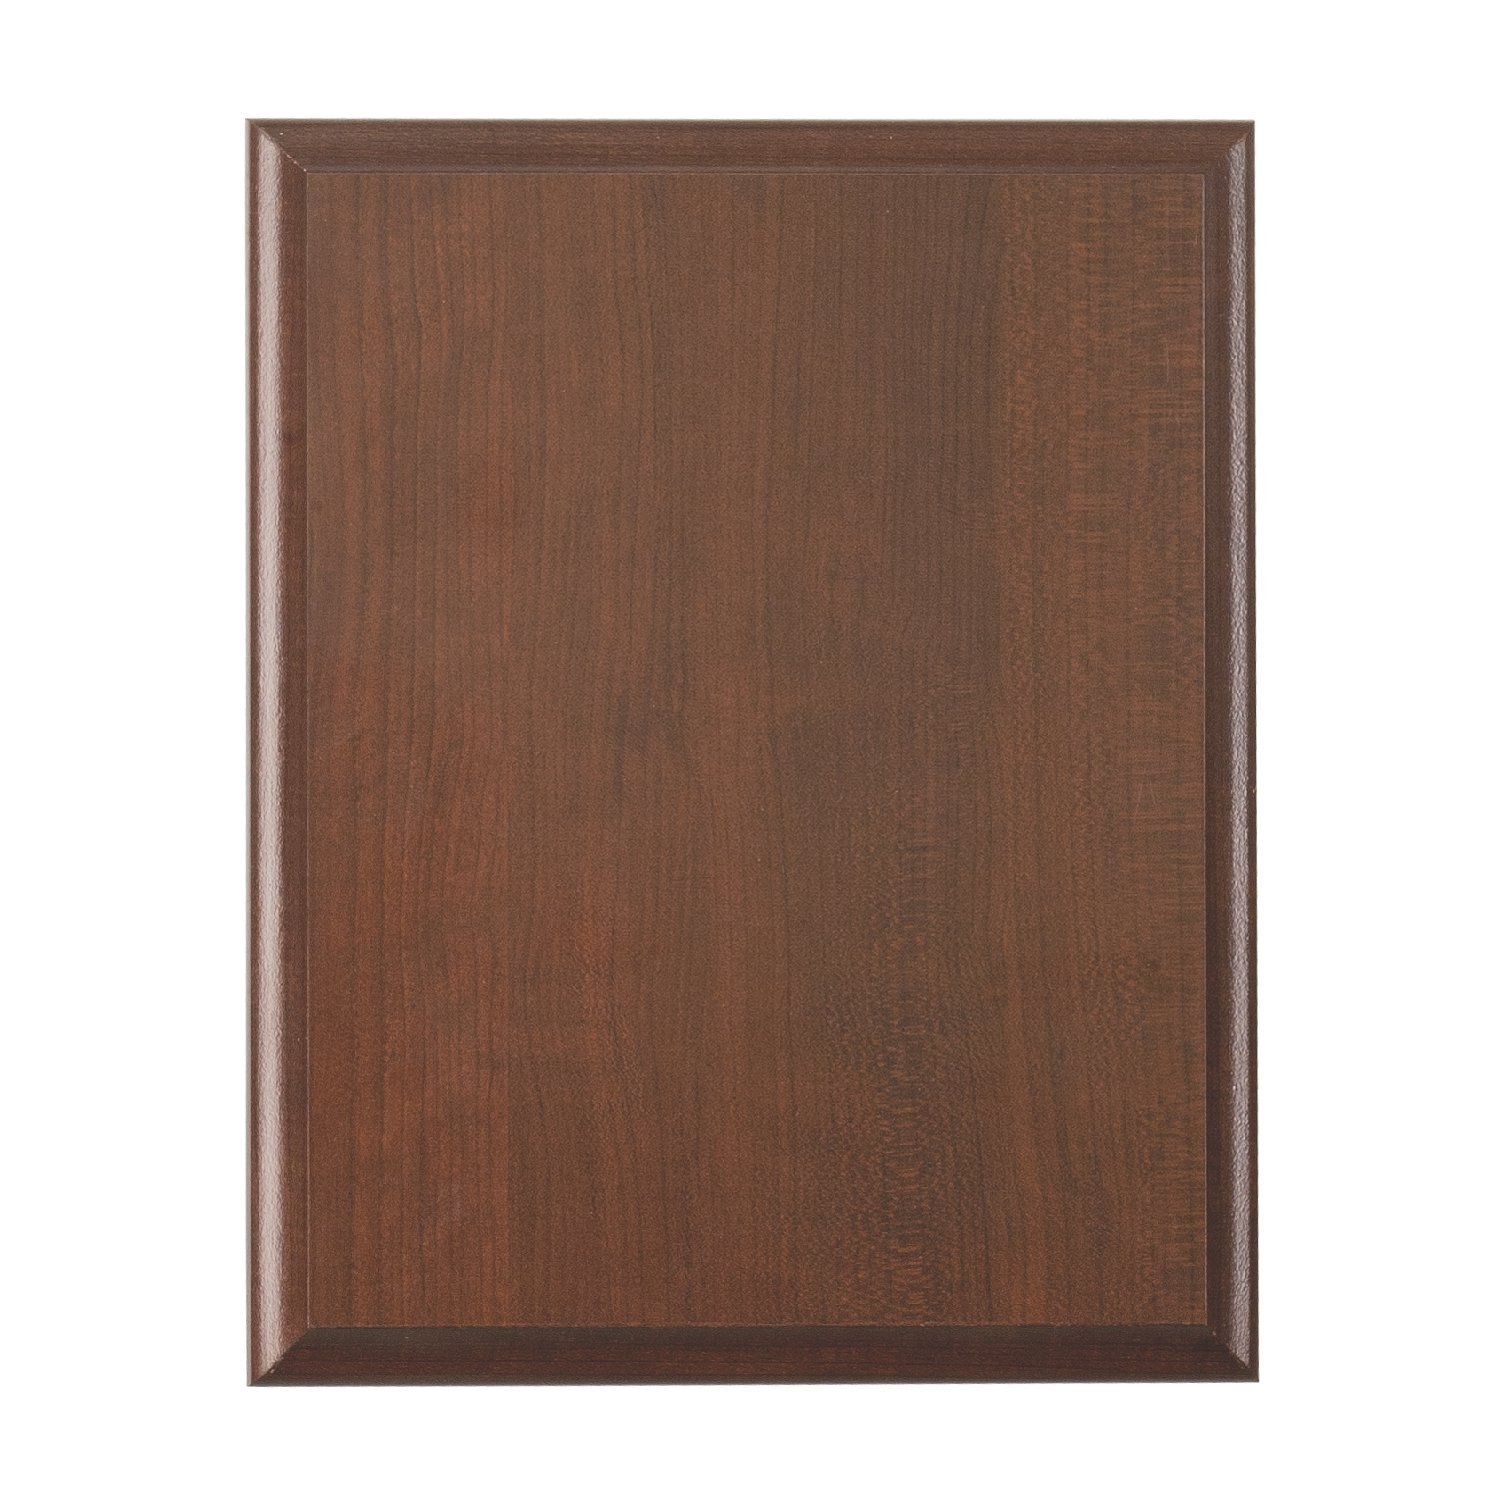 Ridgecrest Elegant Cherry Finish Composite Wood Plaque, 8 by 10-inch